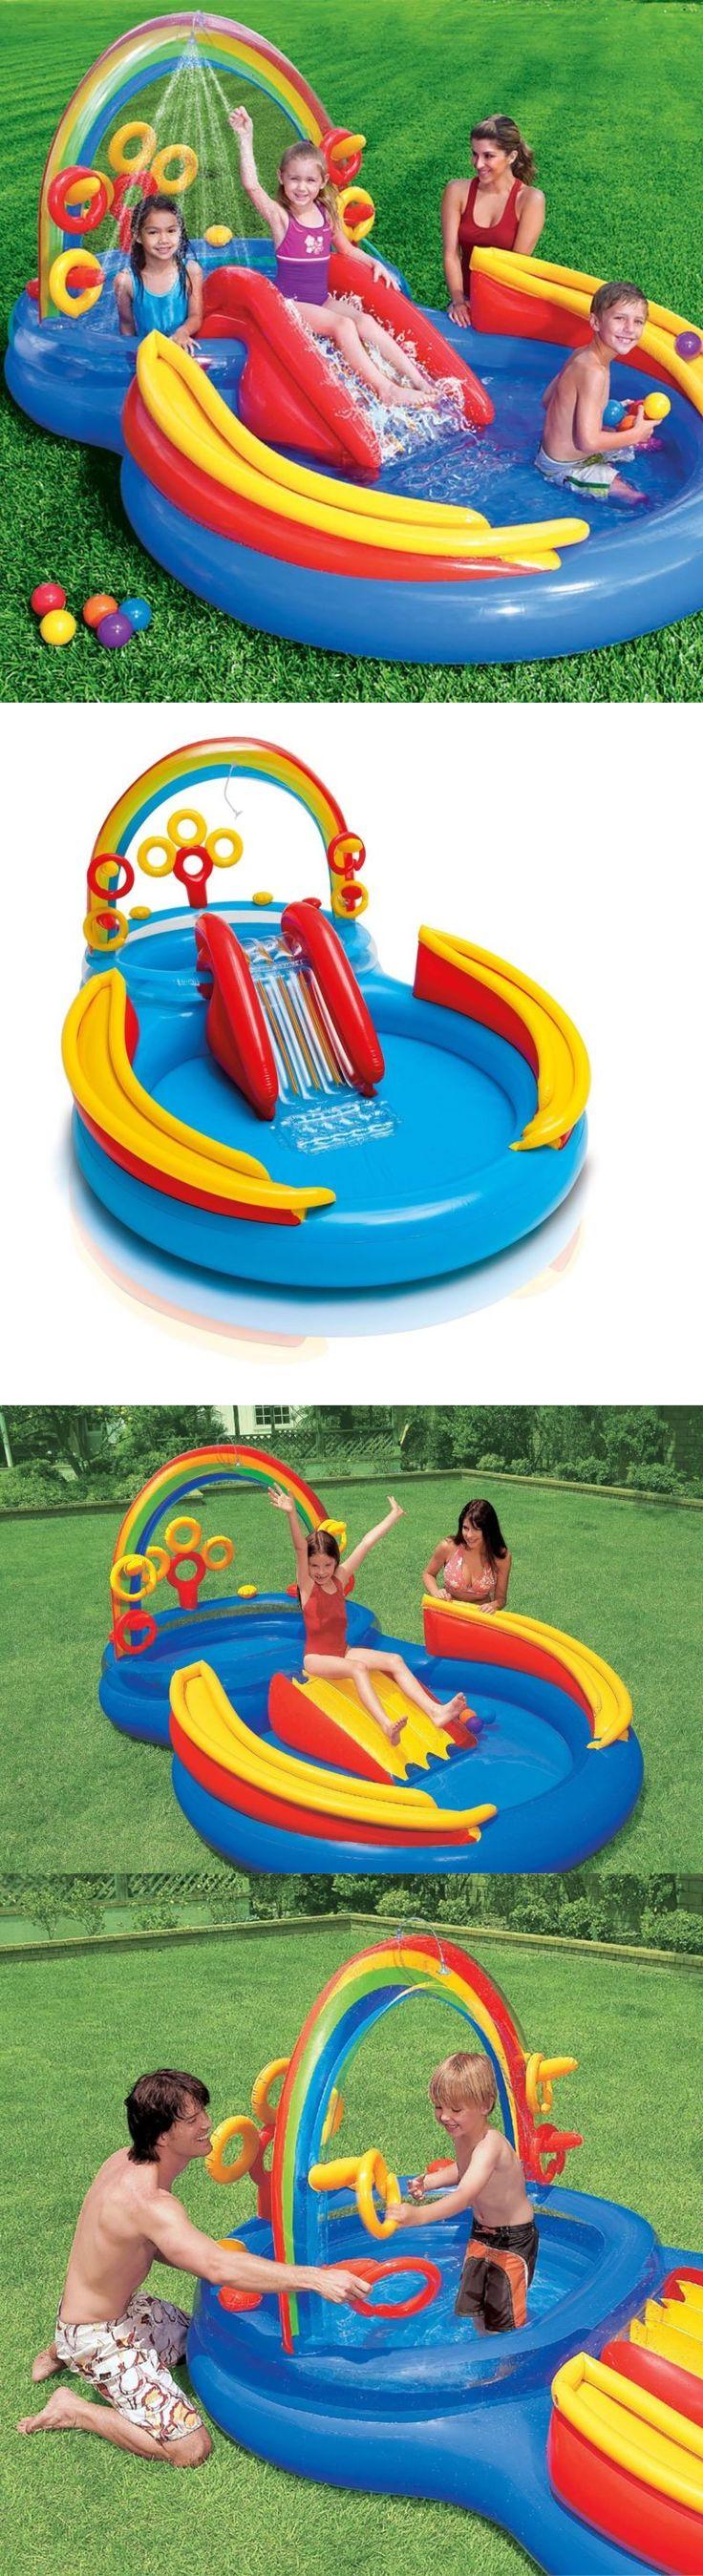 Pools 145989: Usa Backyard Inflatable Water Slide Pool Kids Outdoor Splash Bounce Play House N -> BUY IT NOW ONLY: $58.42 on eBay!